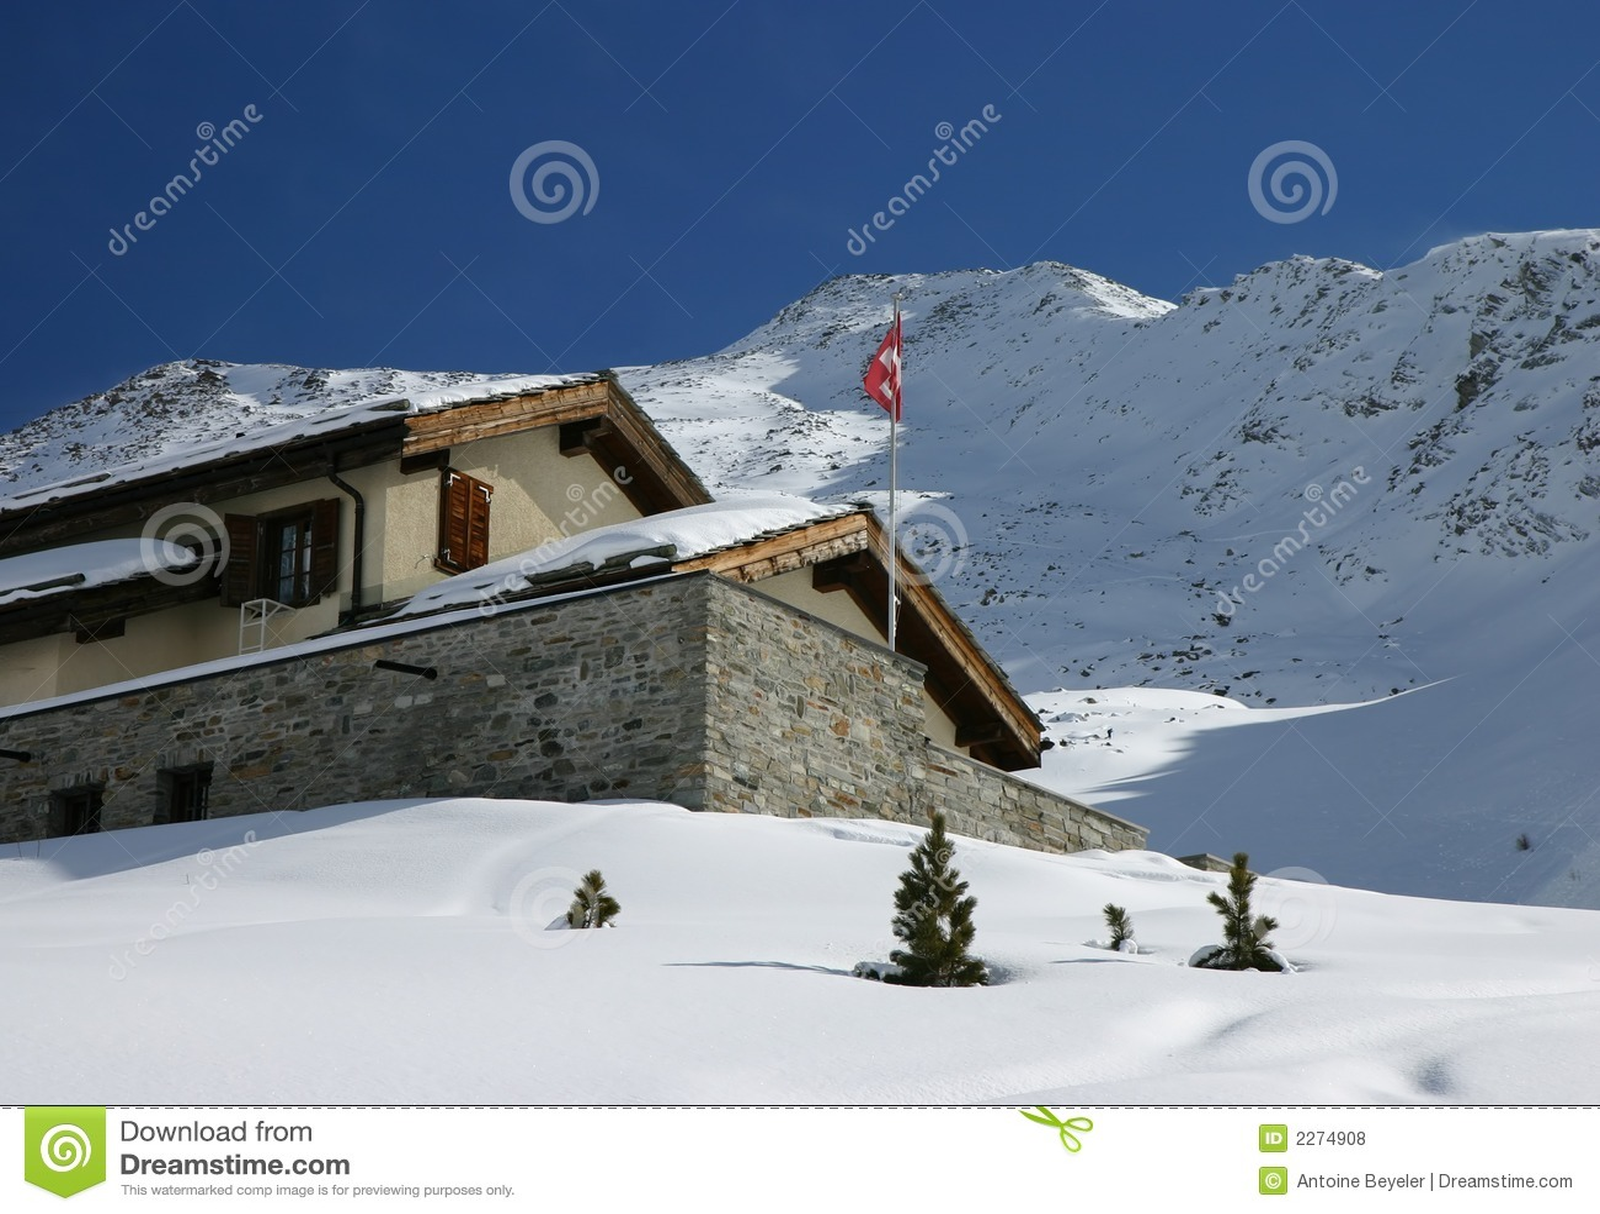 Swiss alpine cabin